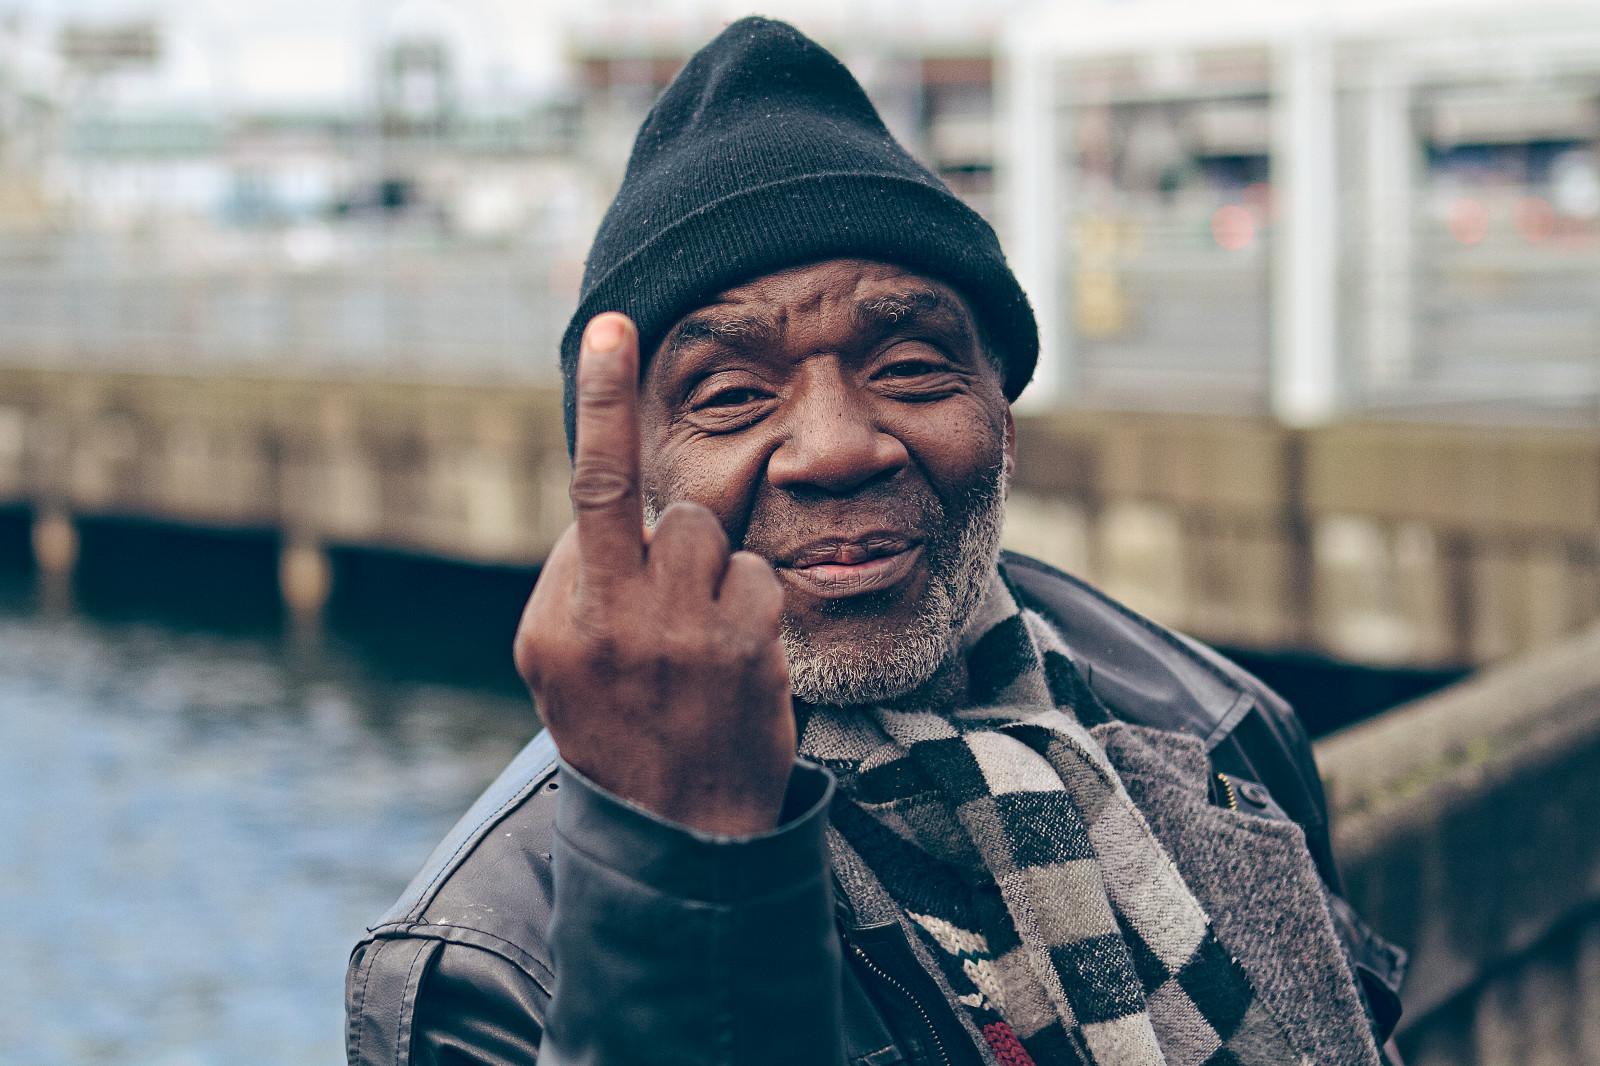 https://c.wallhere.com/photos/7e/1e/birthday_seattle_urban_man_male_guy_water_hat-868942.jpg!d